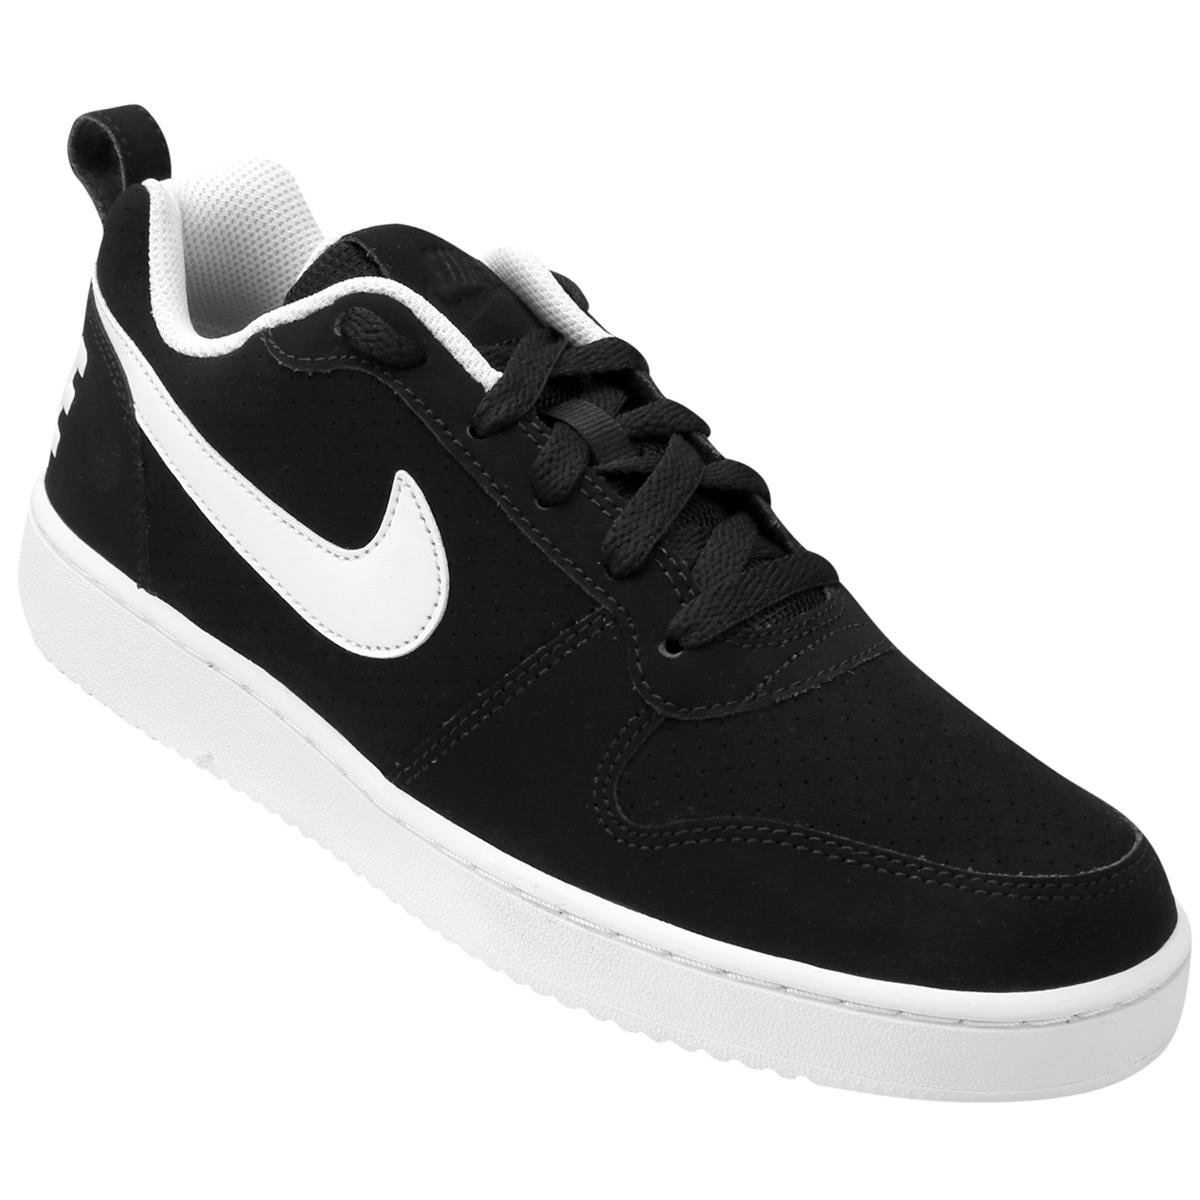 caea2235a04 Tênis Nike Recreation Low Masculino - Compre Agora